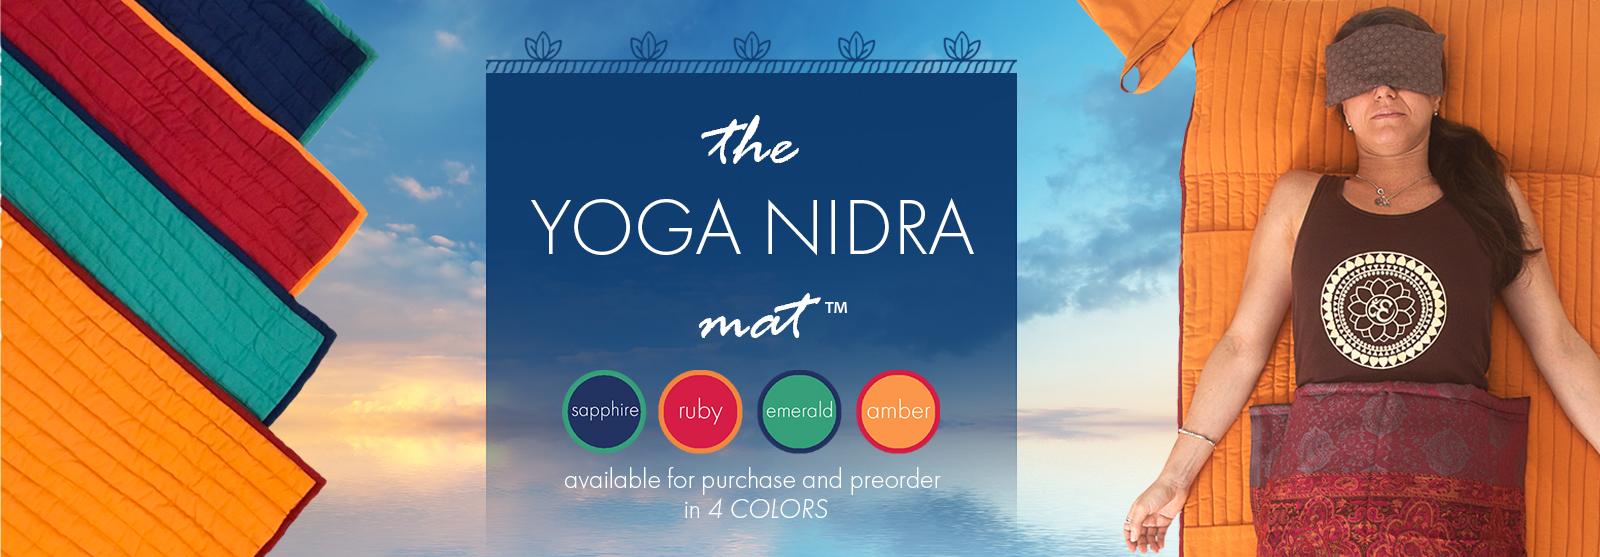 Yoga Nidra Mat